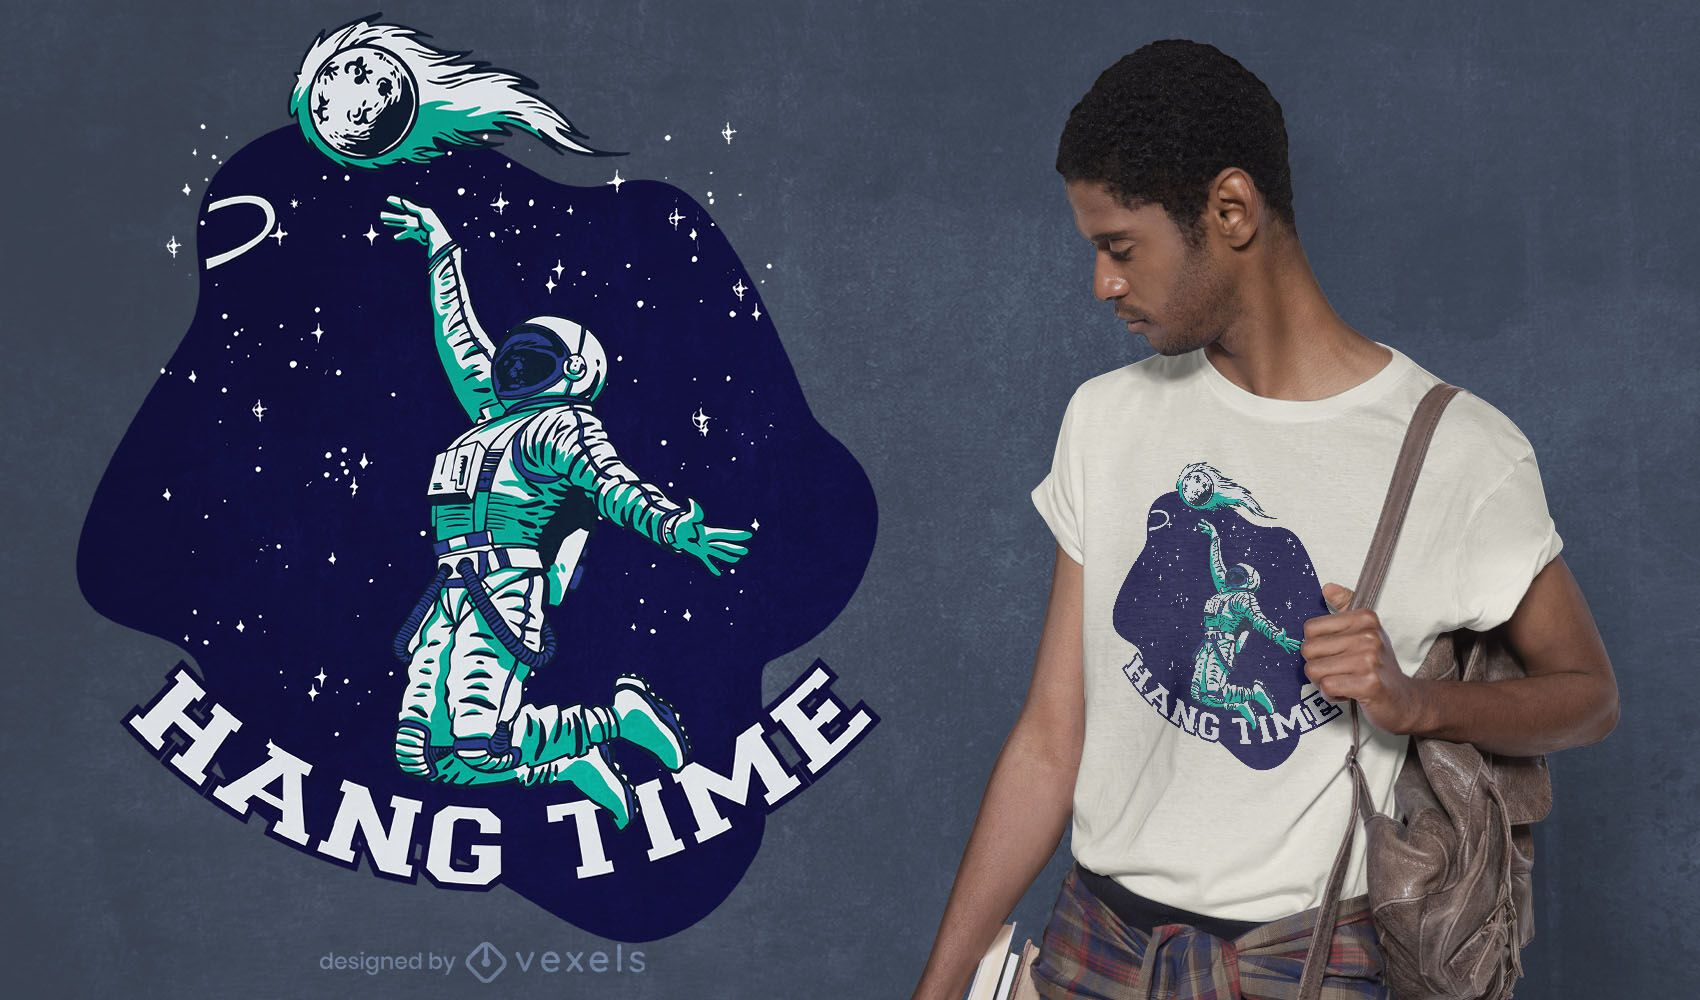 Hang time t-shirt design